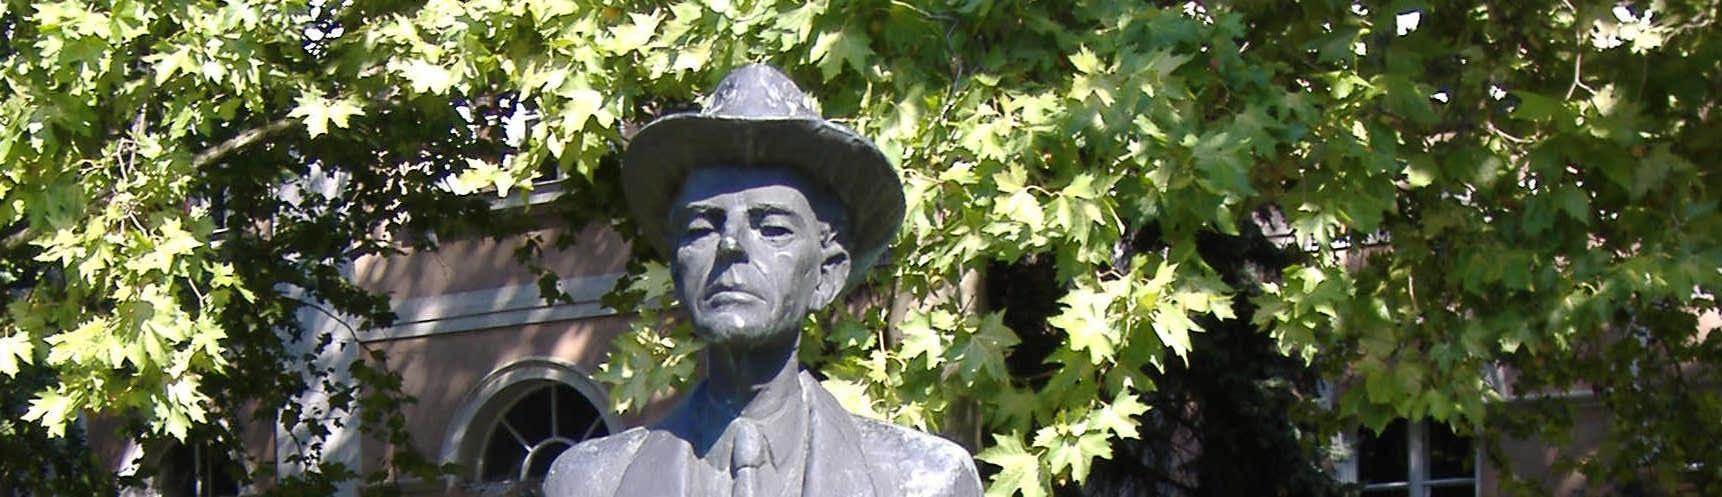 Statue_of_Béla_Bartók